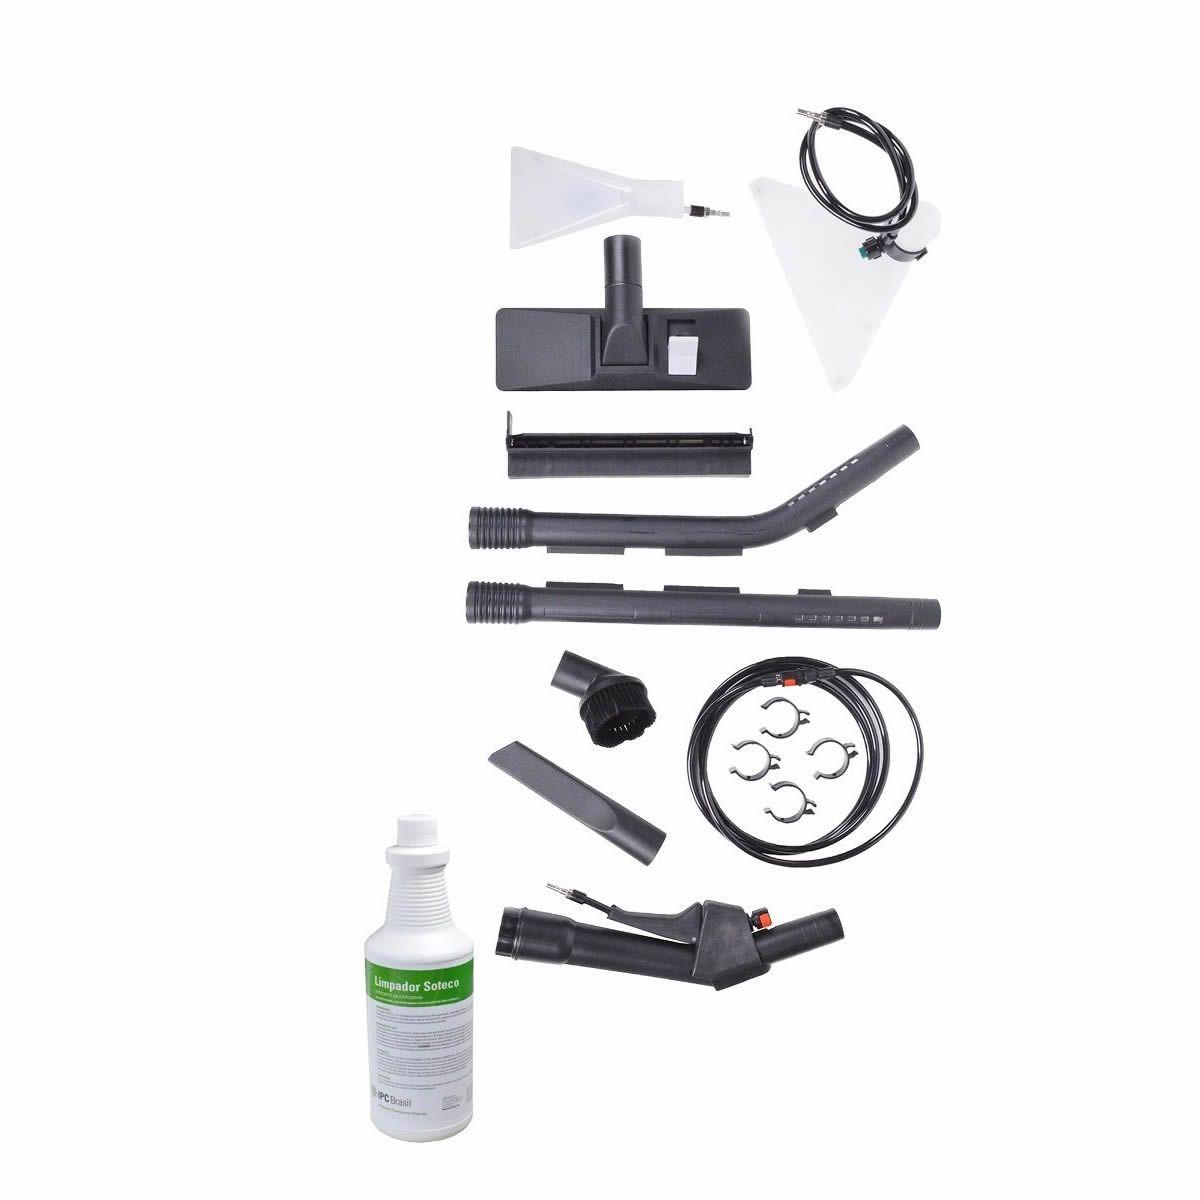 Extratora LavaClean - IPC Soteco - 220V  - Loja Go Eco Wash